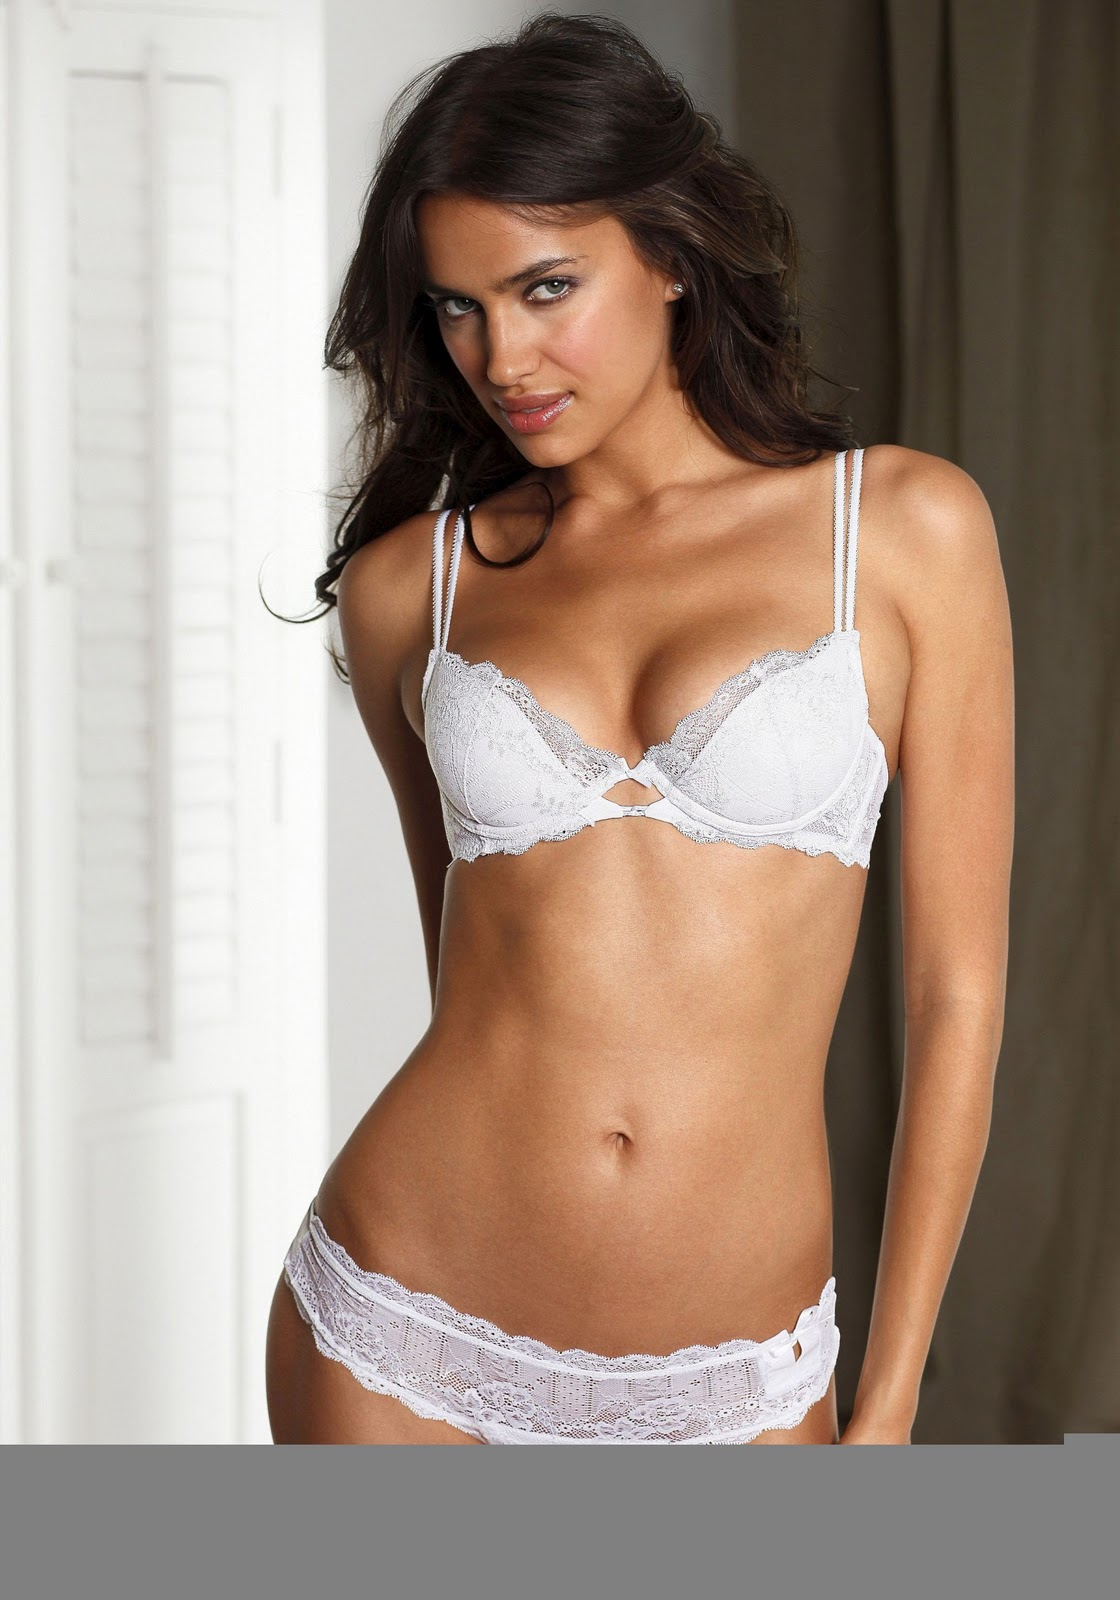 http://3.bp.blogspot.com/-Zfr4x-ioIHc/TxrwYhuC6GI/AAAAAAAACLs/V_mSqGPf9M0/s1600/irina-shayk-lingerie-001.jpg